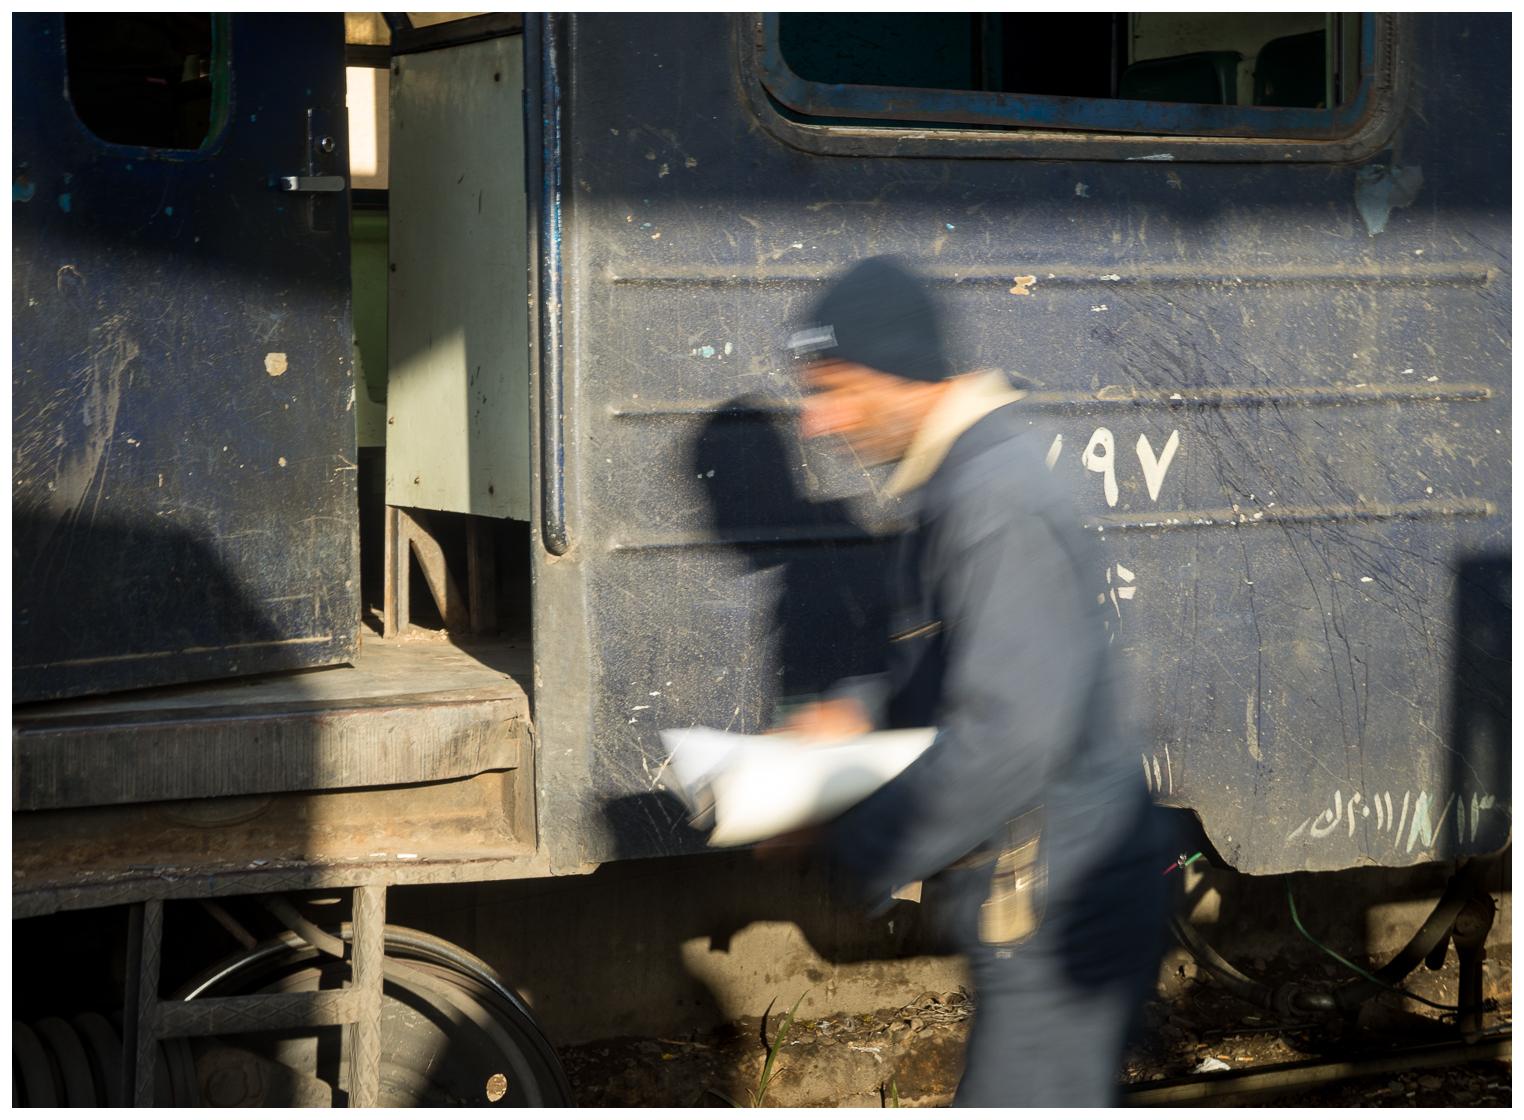 Luxor Train Inspector